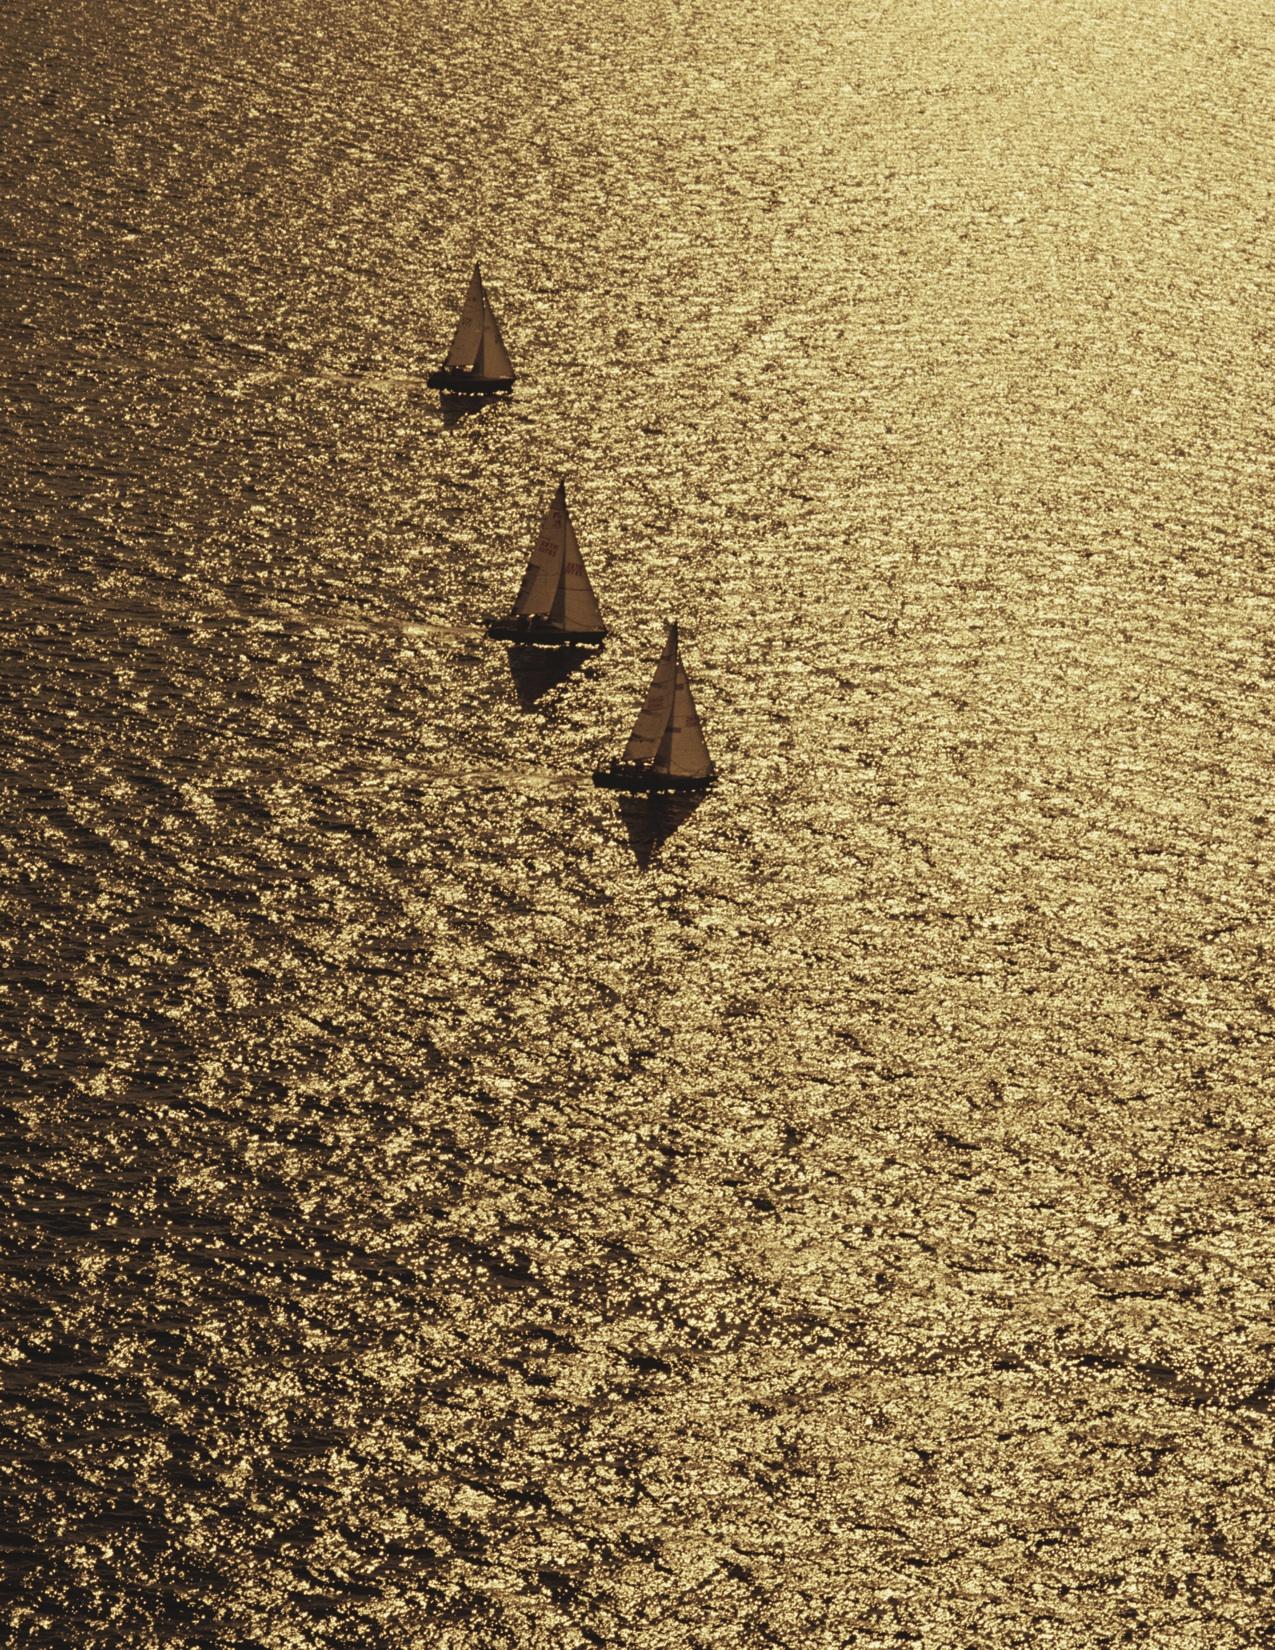 SailboatsHC1305 copy